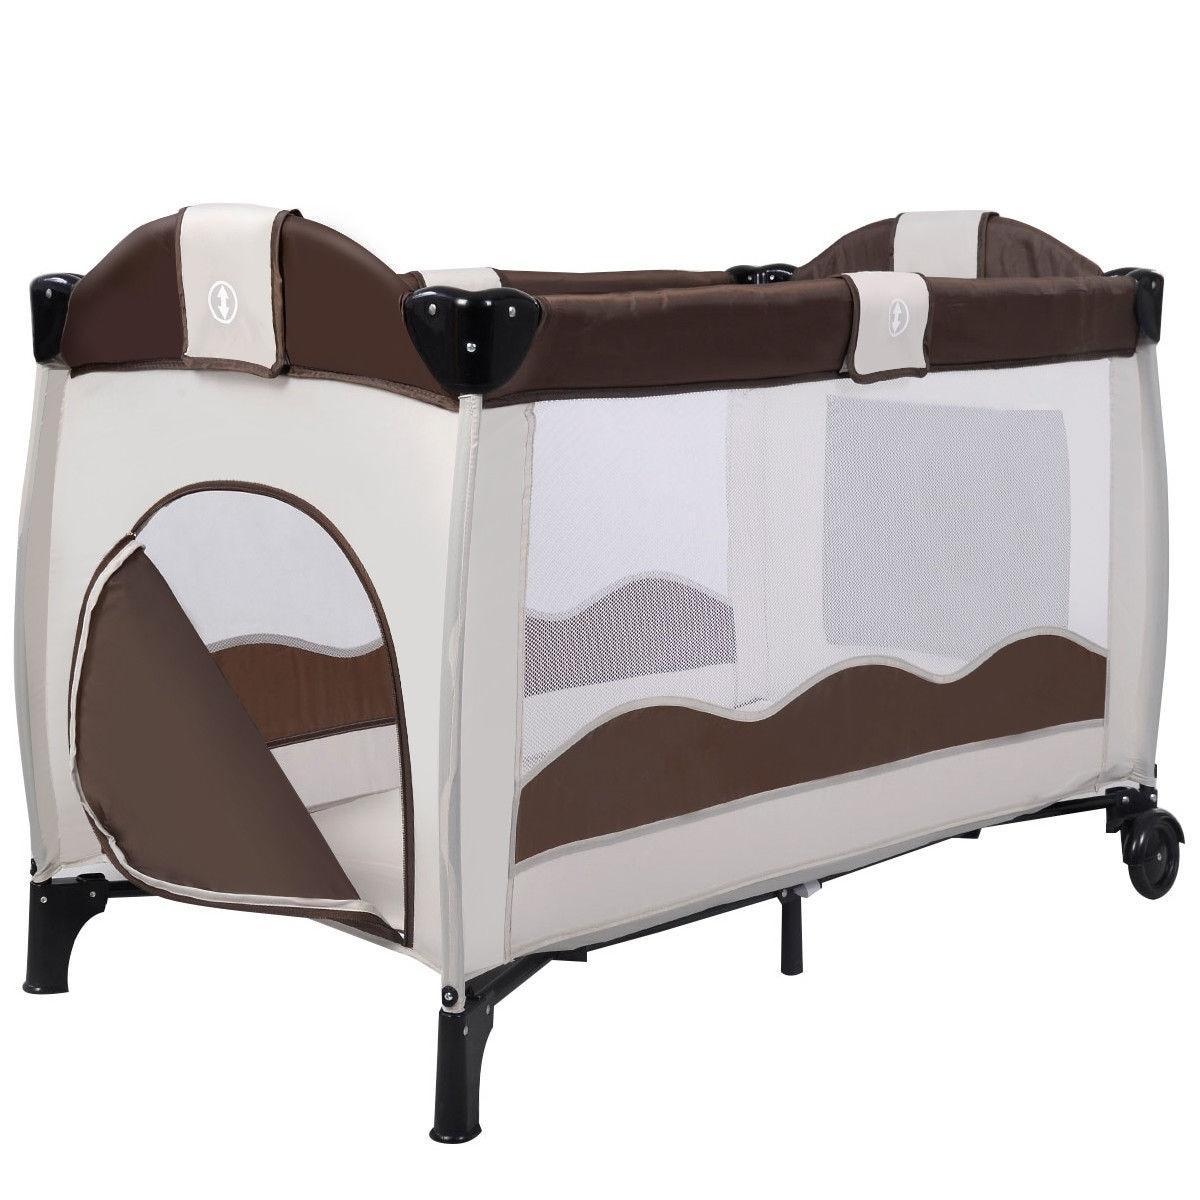 - Shop Baby Crib Playpen Playard Pack Travel Infant Bassinet Bed